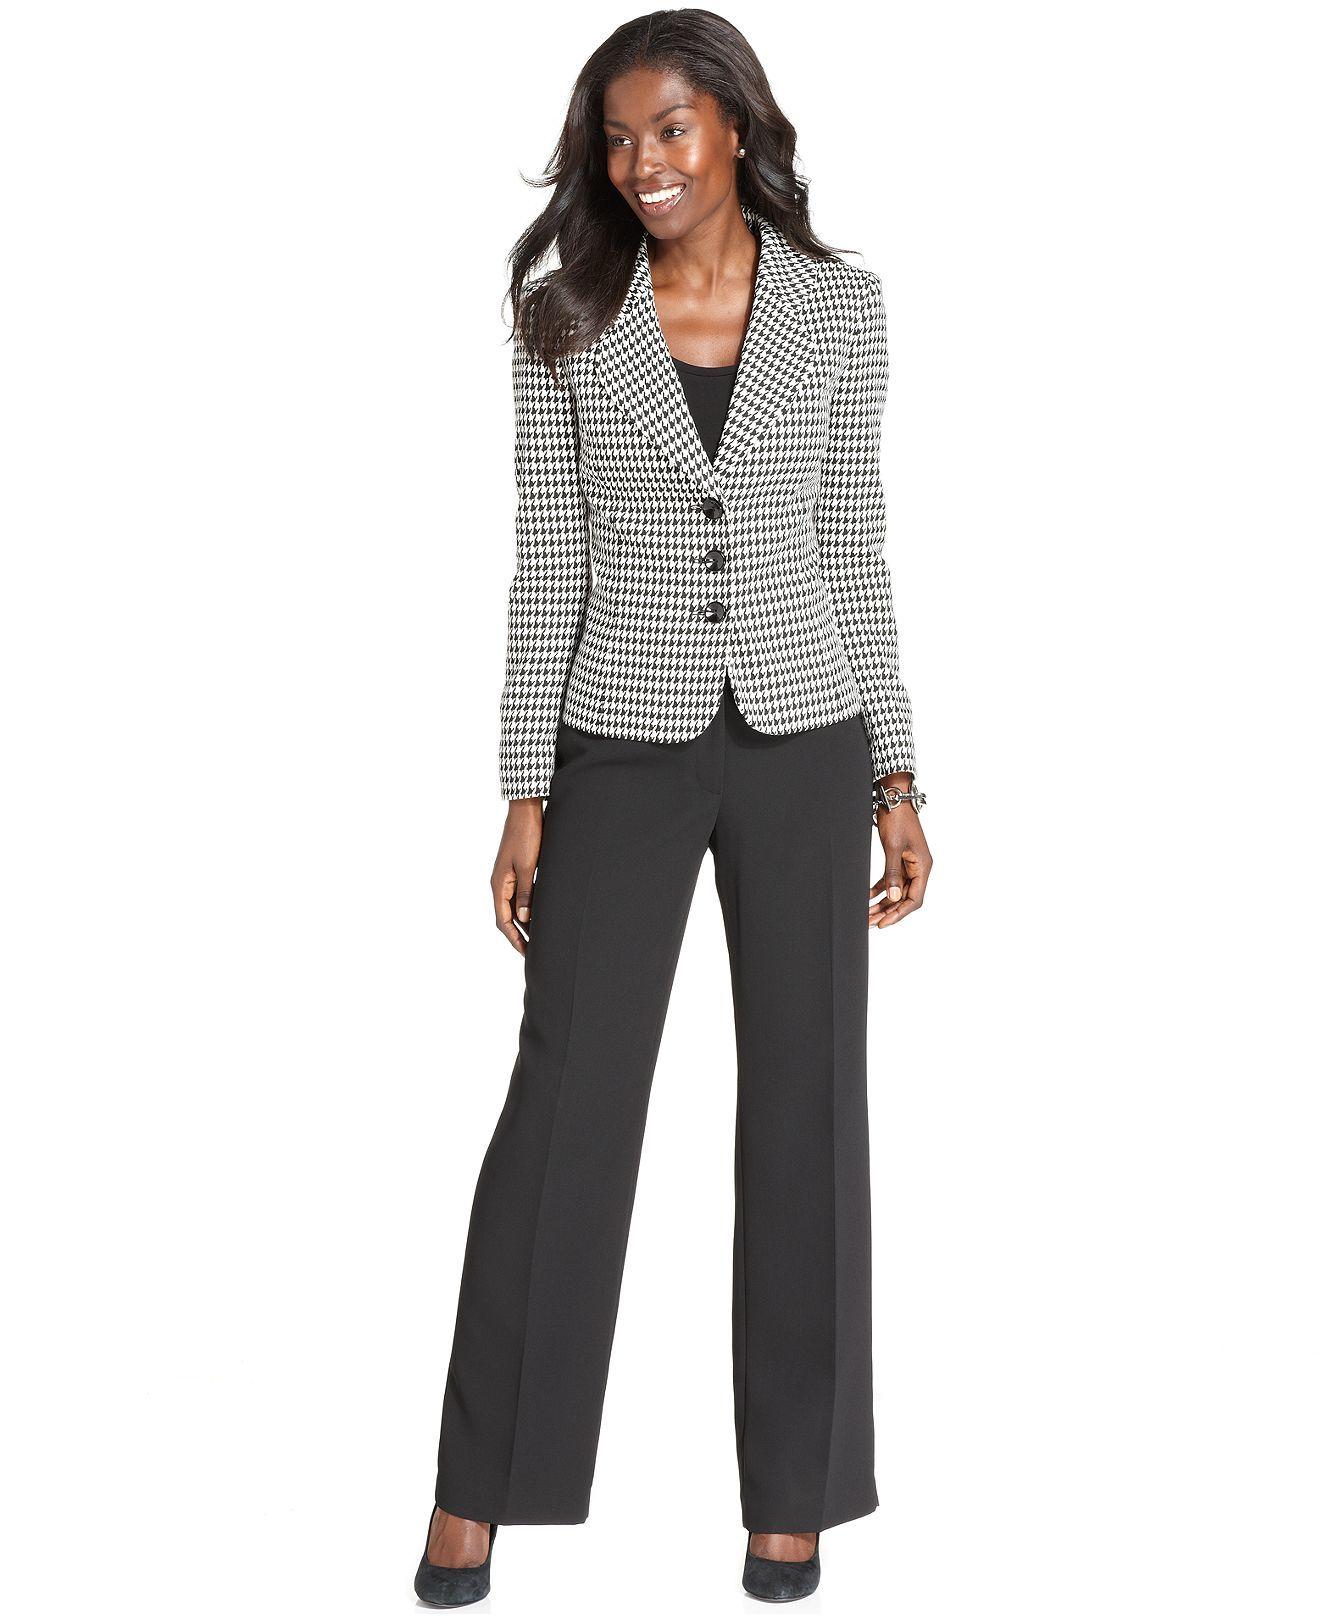 Kasper Suit Separates Collection - Wear to Work - Women - Macy's | Suits  for women, Clothes, Suit separates